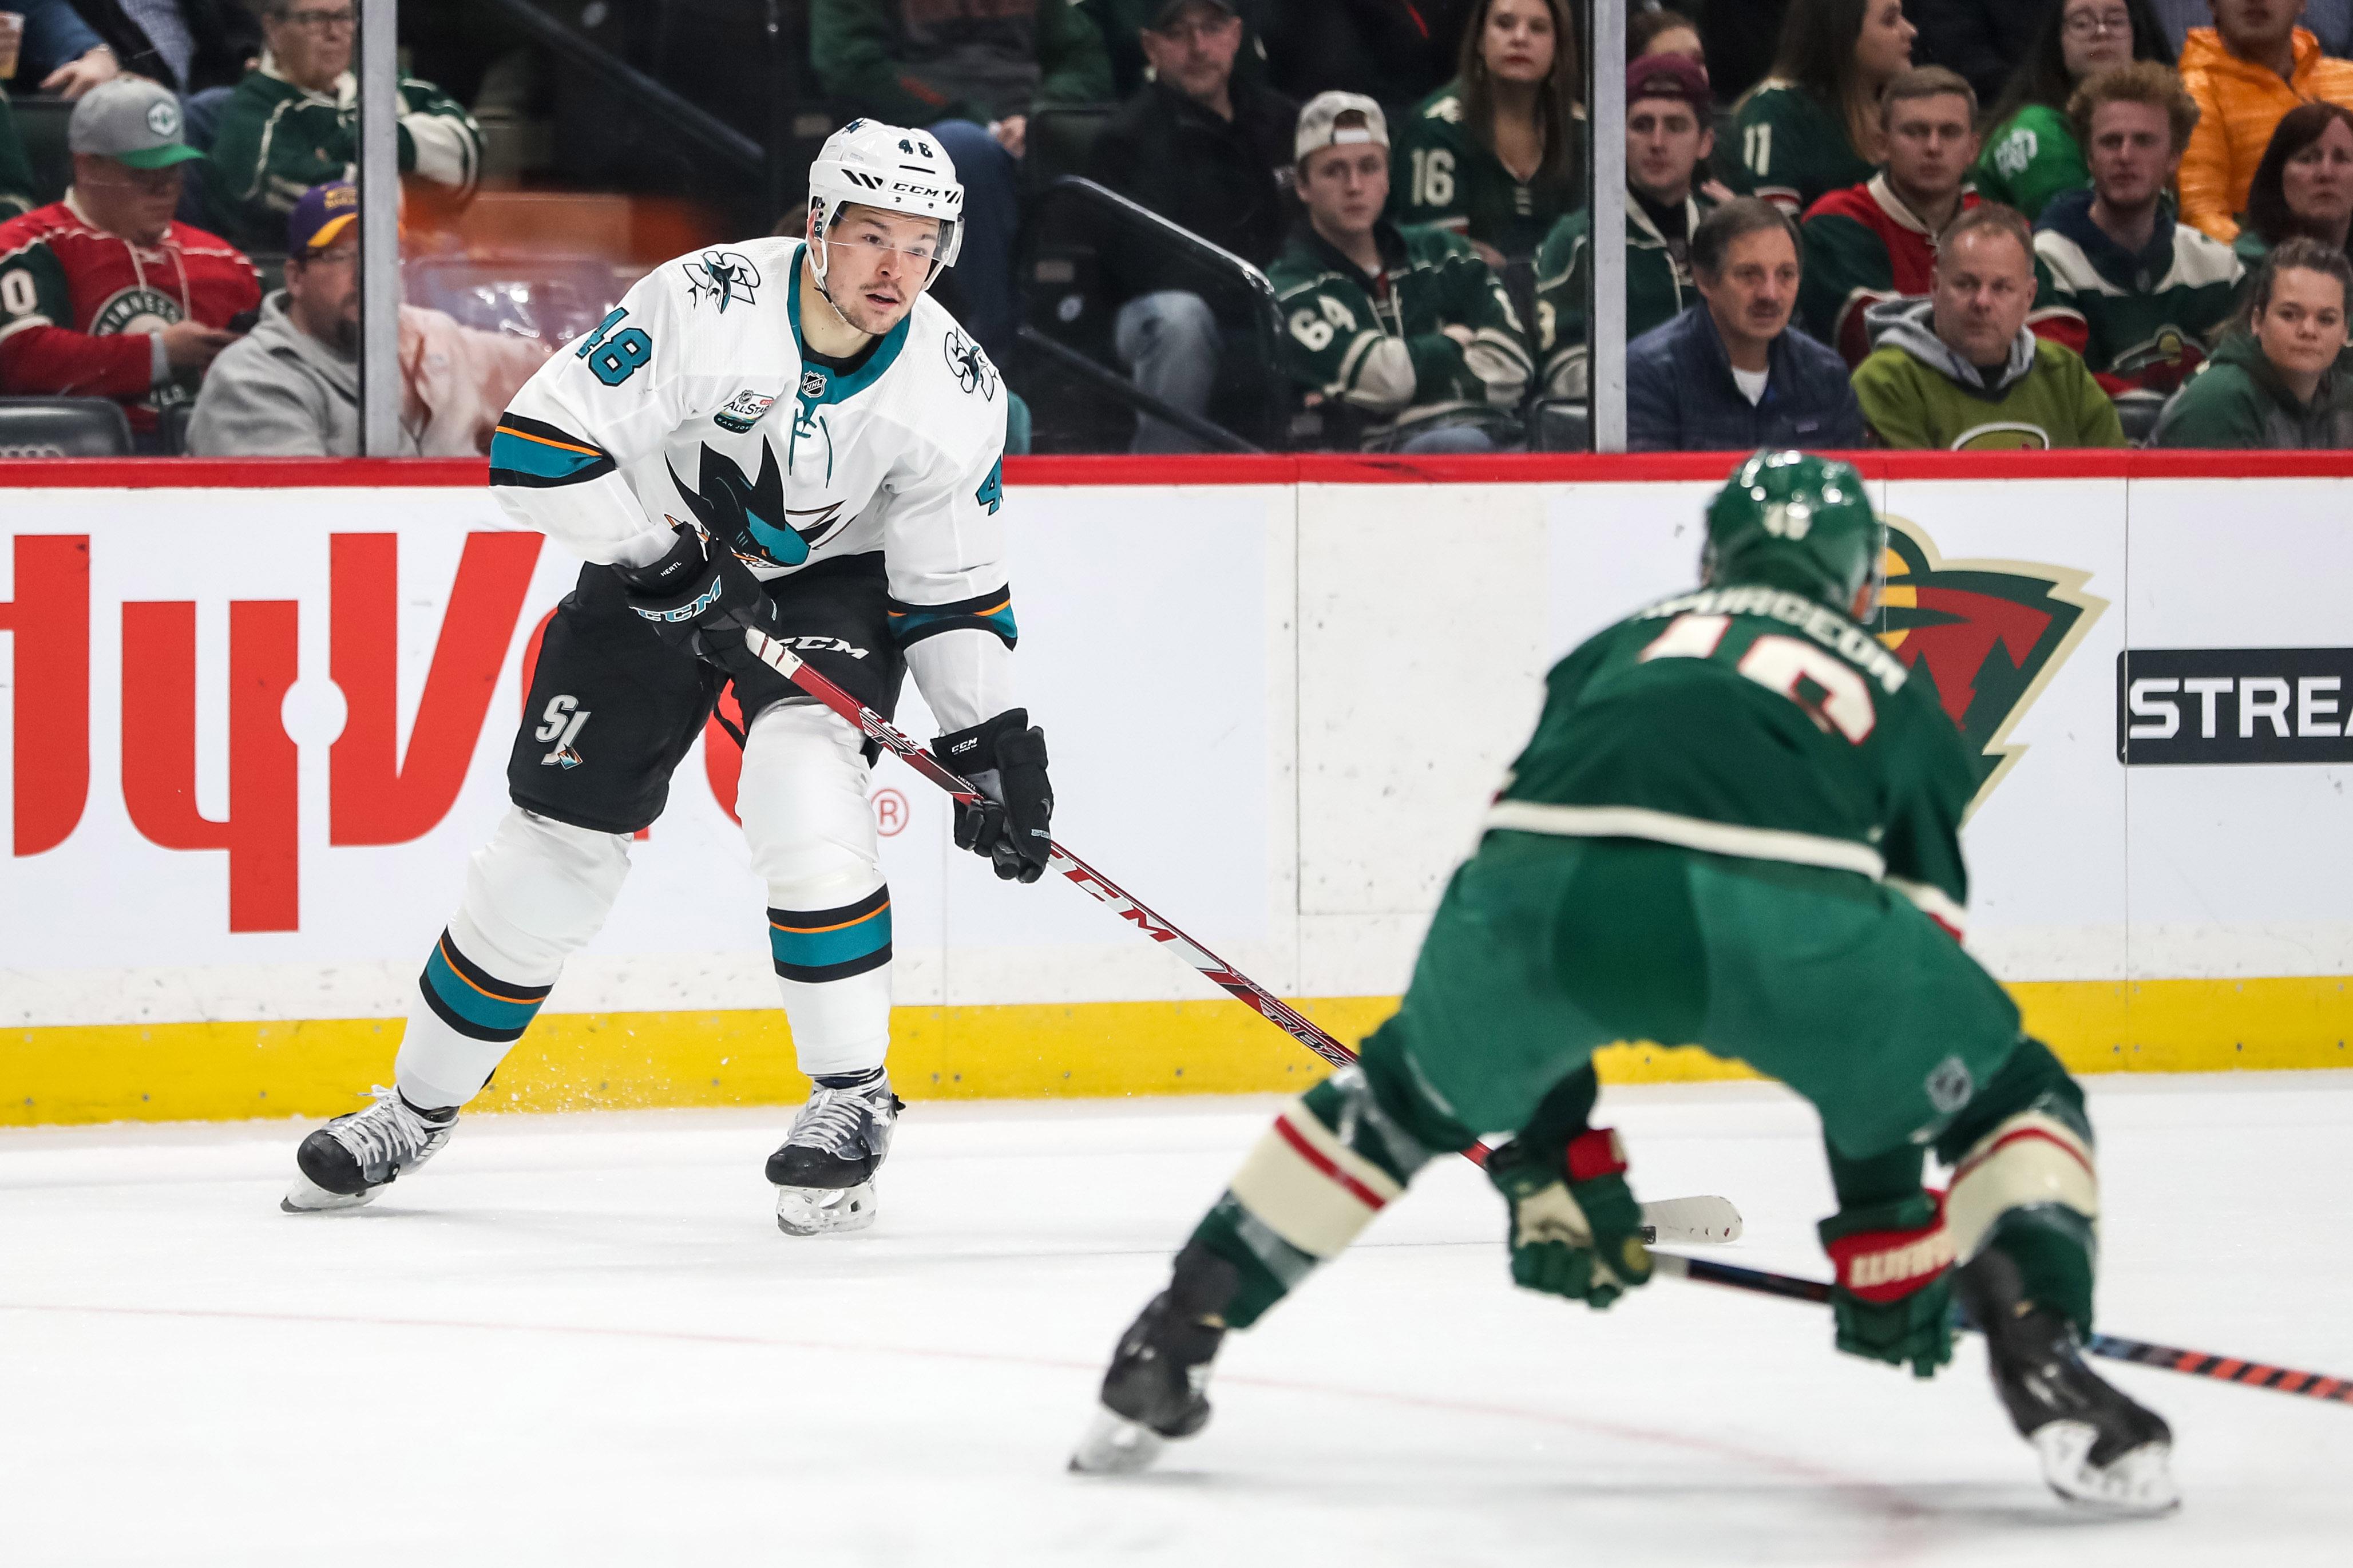 Dec 18, 2018; Saint Paul, MN, USA; San Jose Sharks forward Tomas Hertl (48) looks to pass during the first period against the Minnesota Wild at Xcel Energy Center. Mandatory Credit: Brace Hemmelgarn